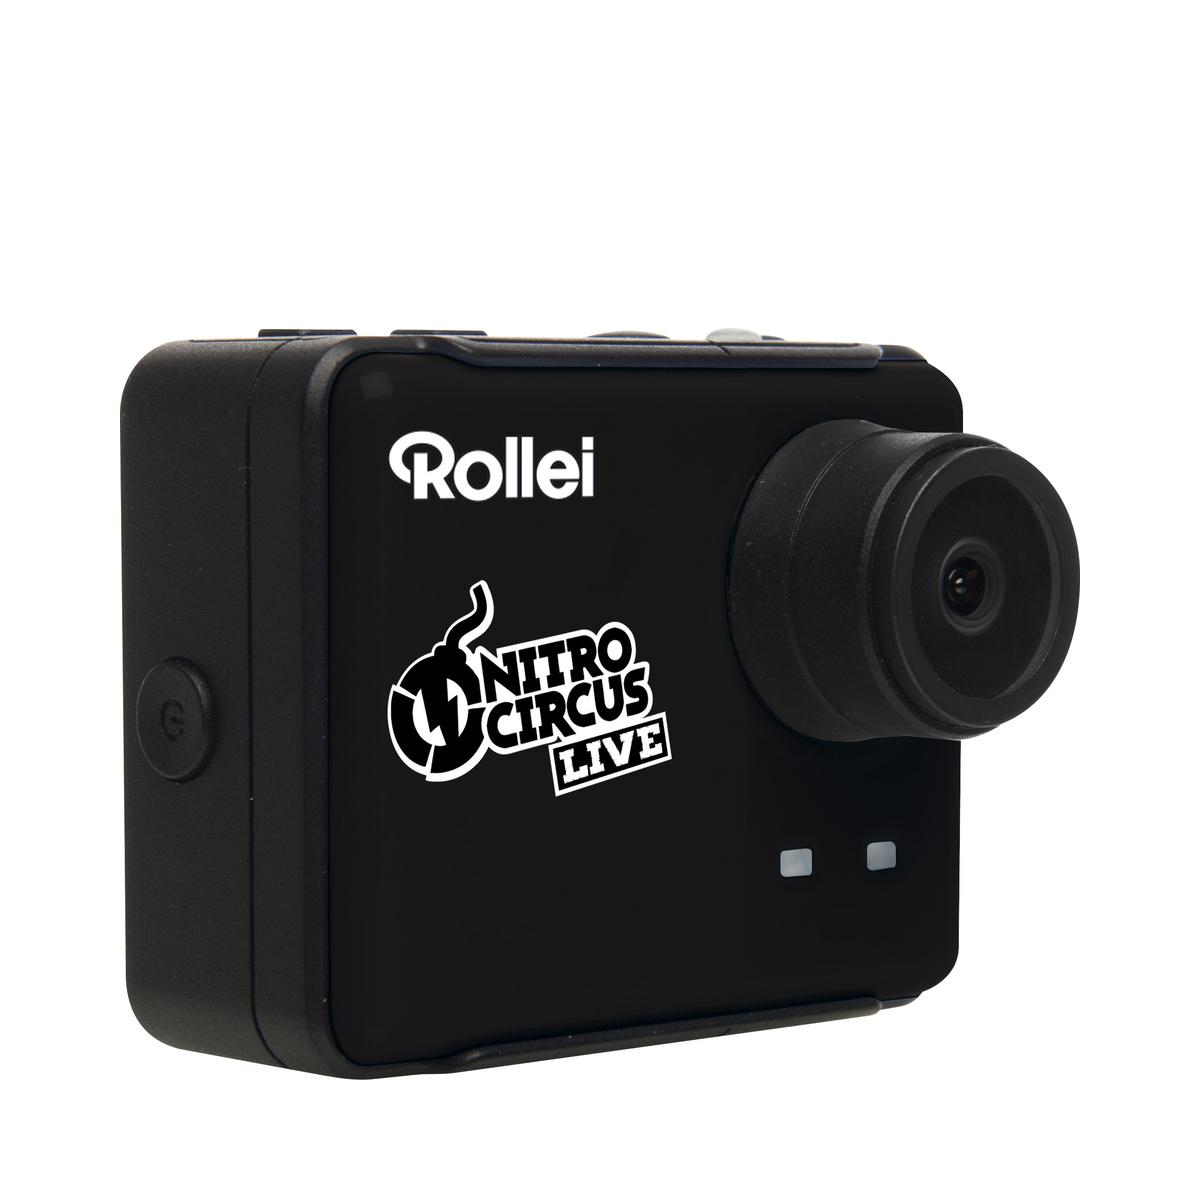 action-camera-rollei-s50-wifi-nitro-circus-black.jpg